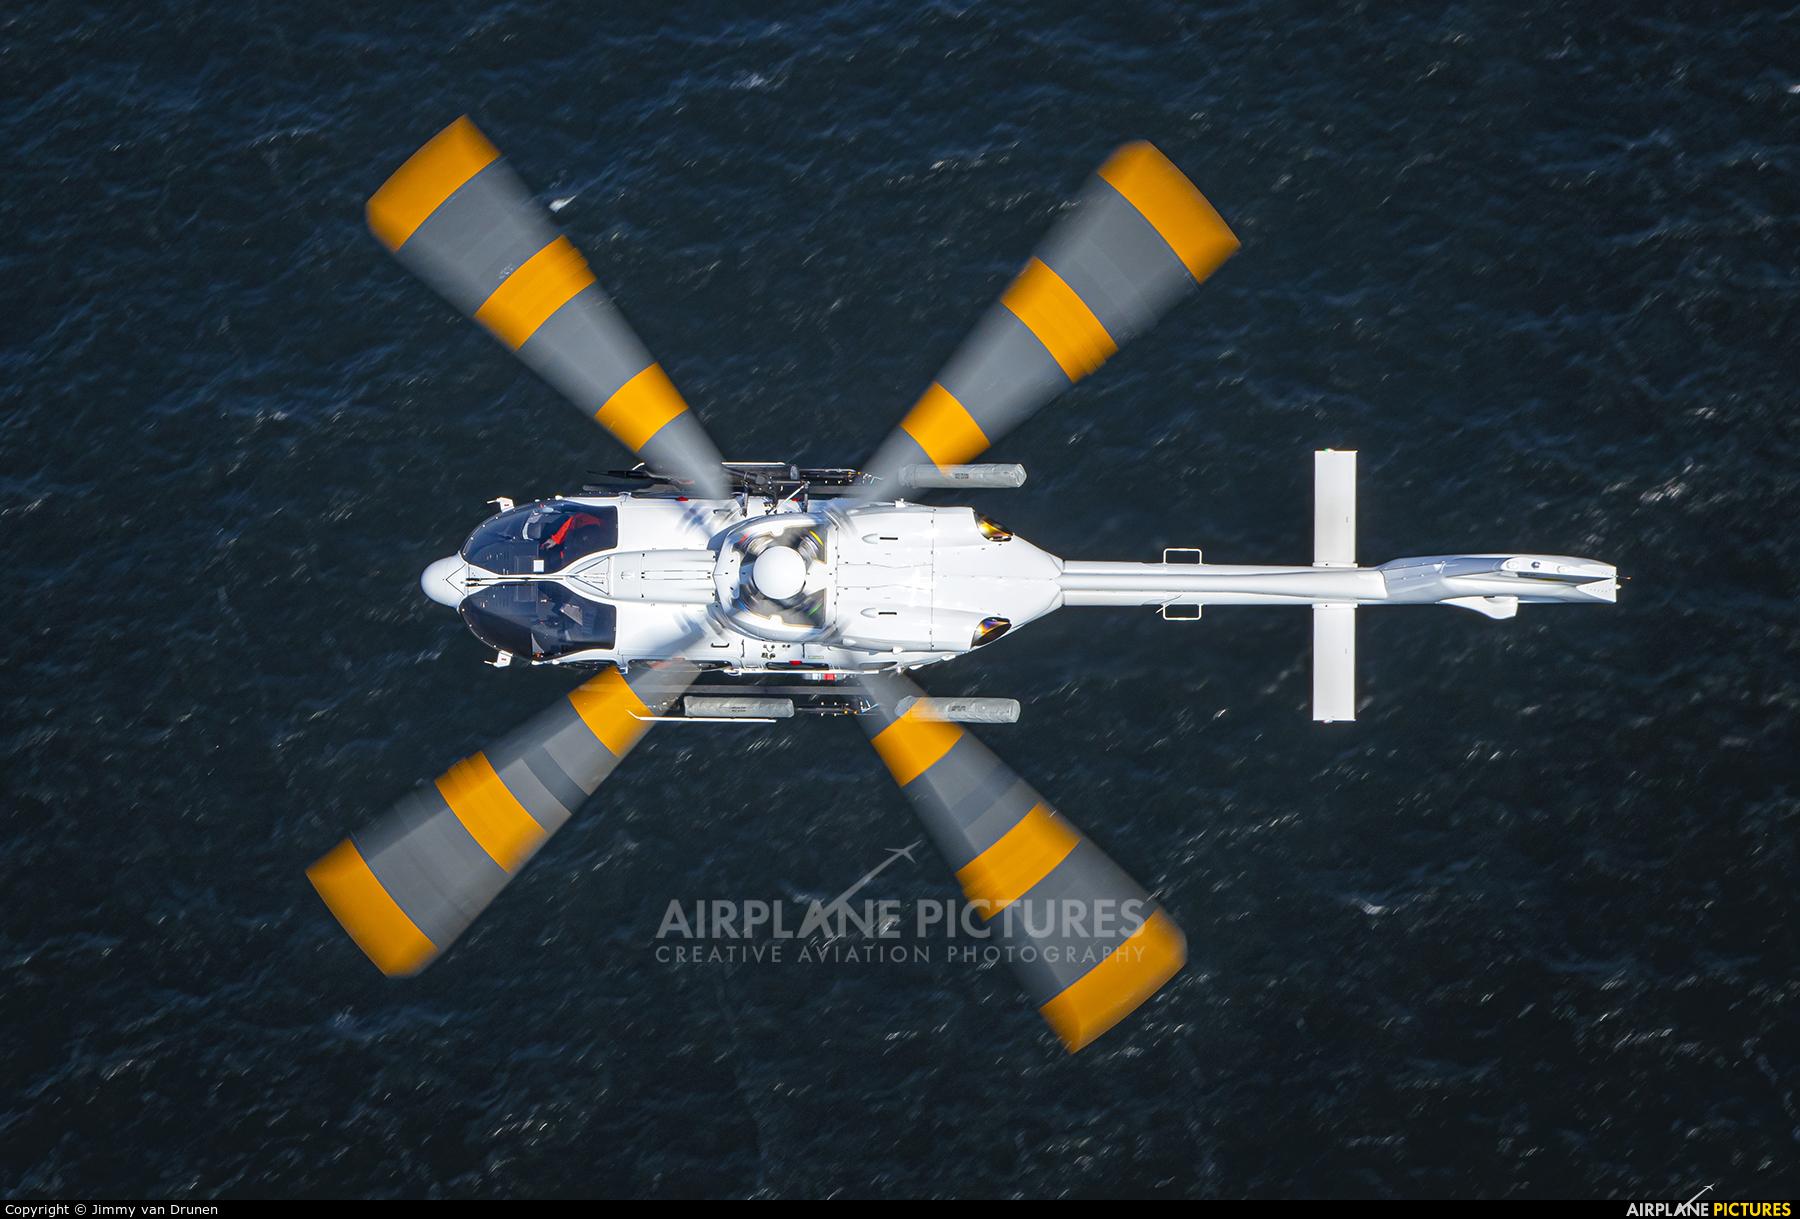 NHV - Noordzee Helikopters Vlaanderen OO-NST aircraft at In Flight - Belgium